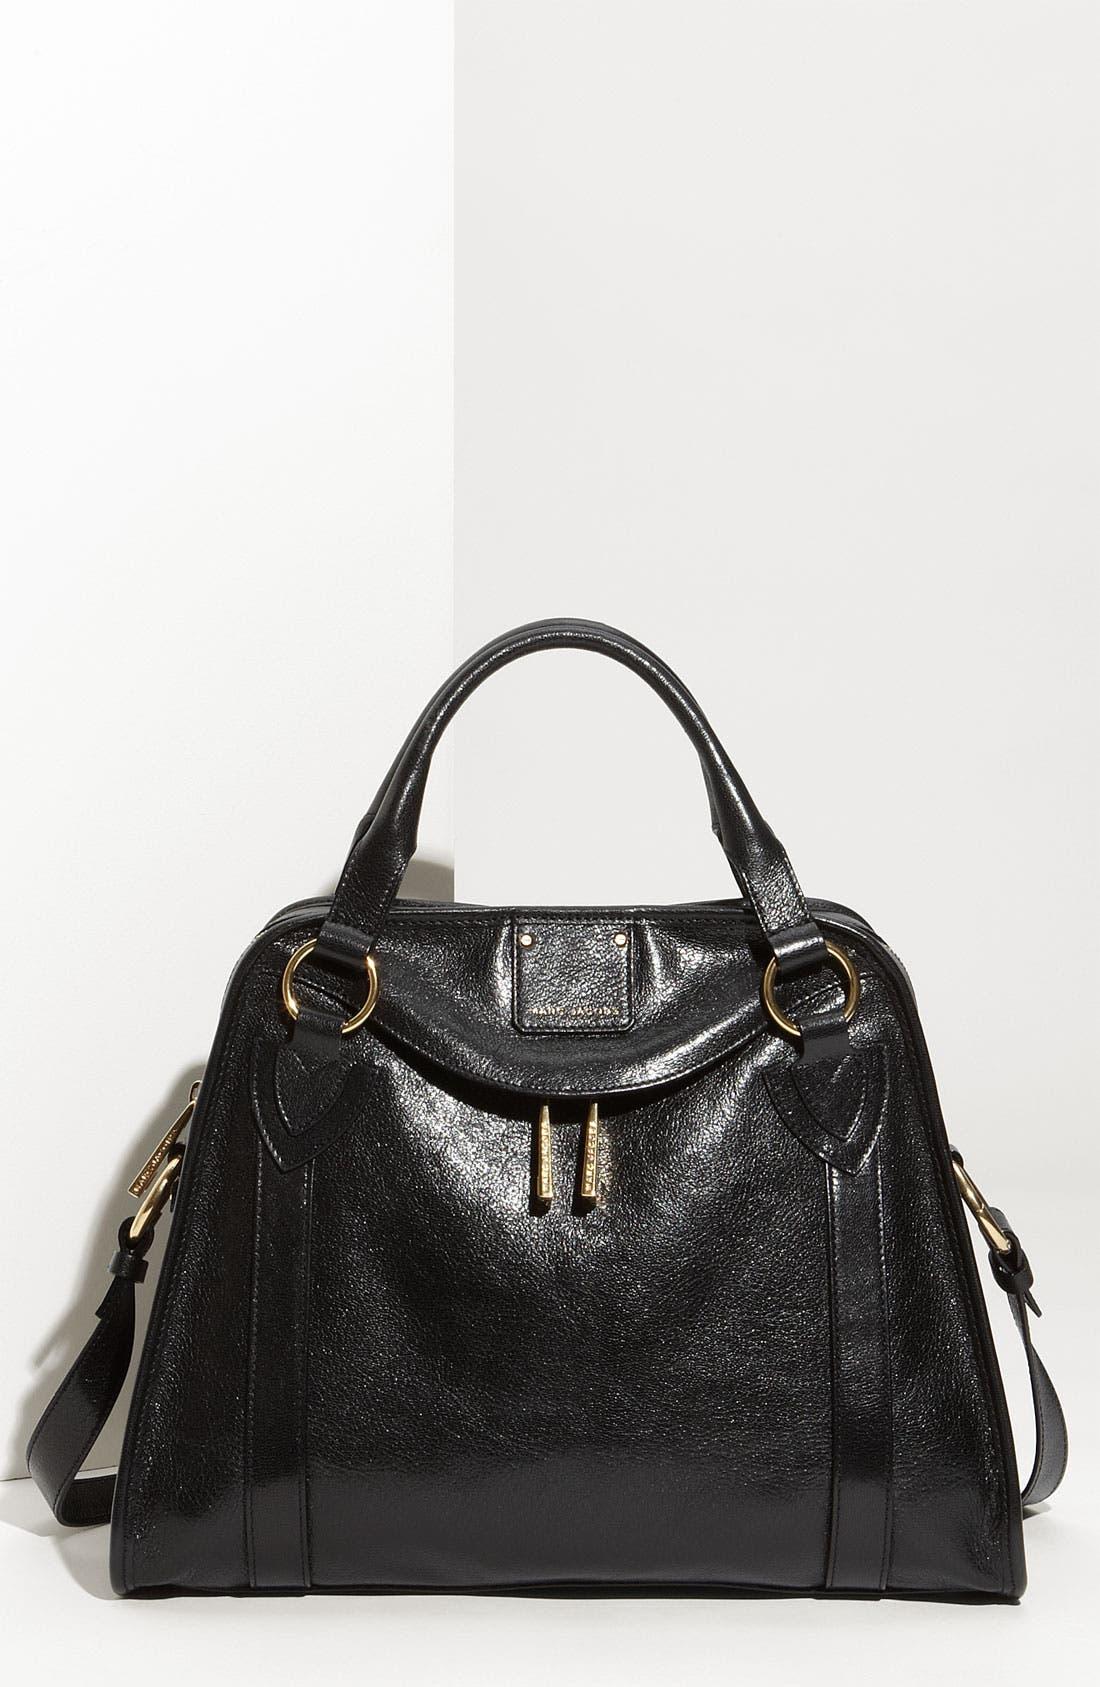 Alternate Image 1 Selected - MARC JACOBS 'Classic Wellington' Leather Satchel